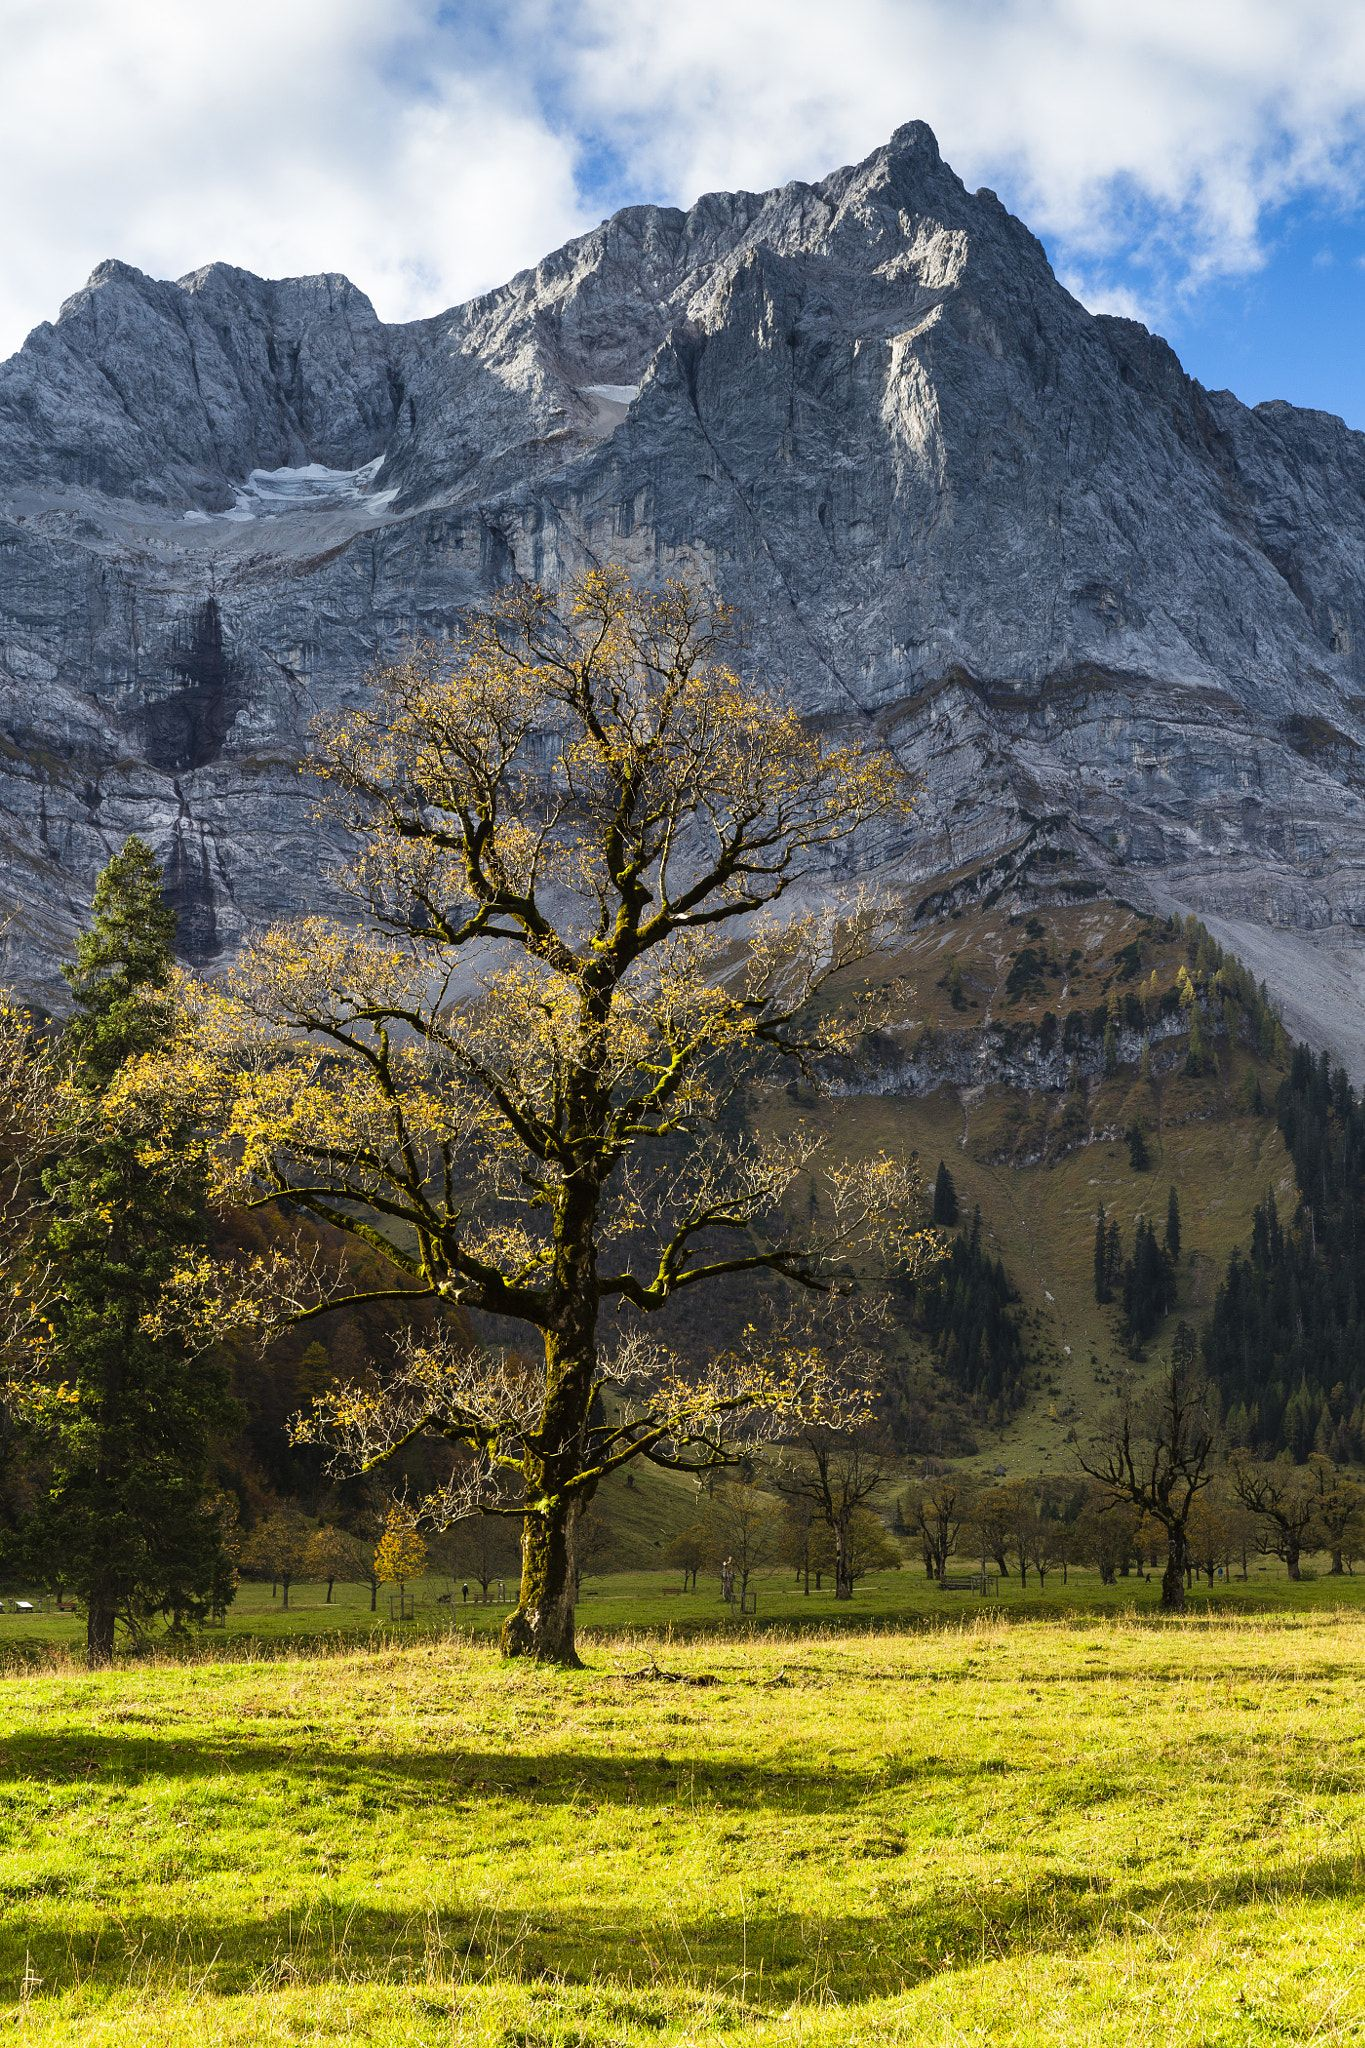 Old Sycamore Maple Acer Pseudoplatanus Tree And Karwendel Range